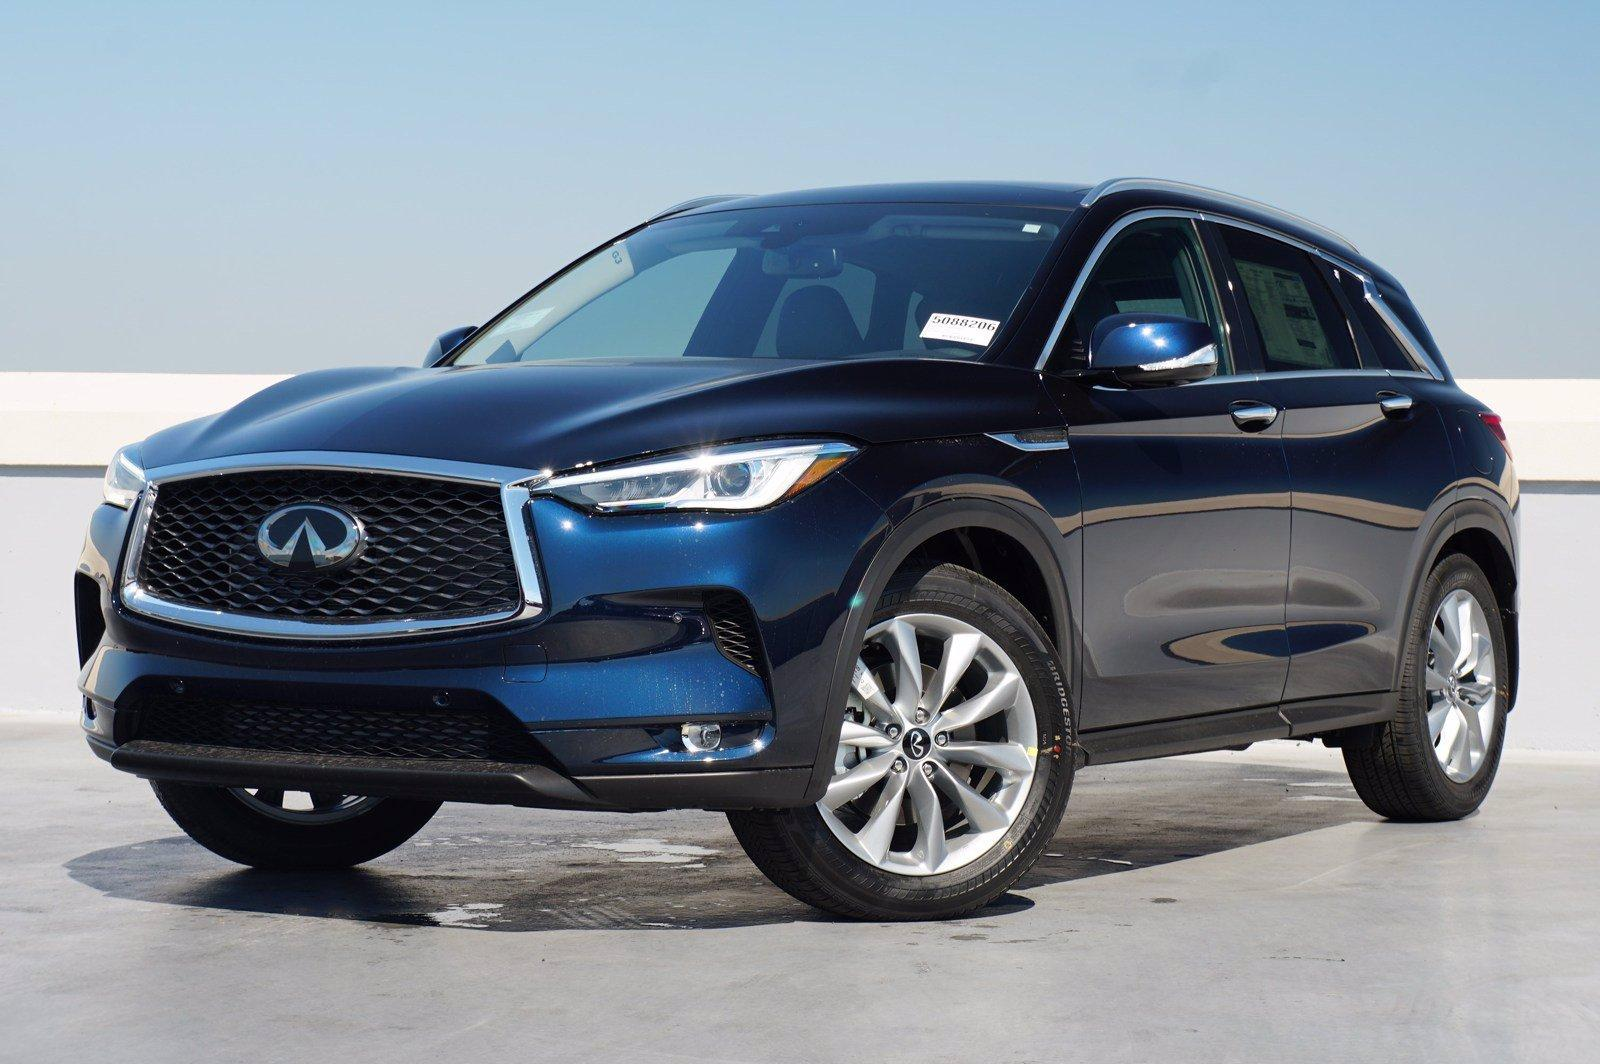 2021 INFINITI QX50 Vehicle Photo in Dallas, TX 75209